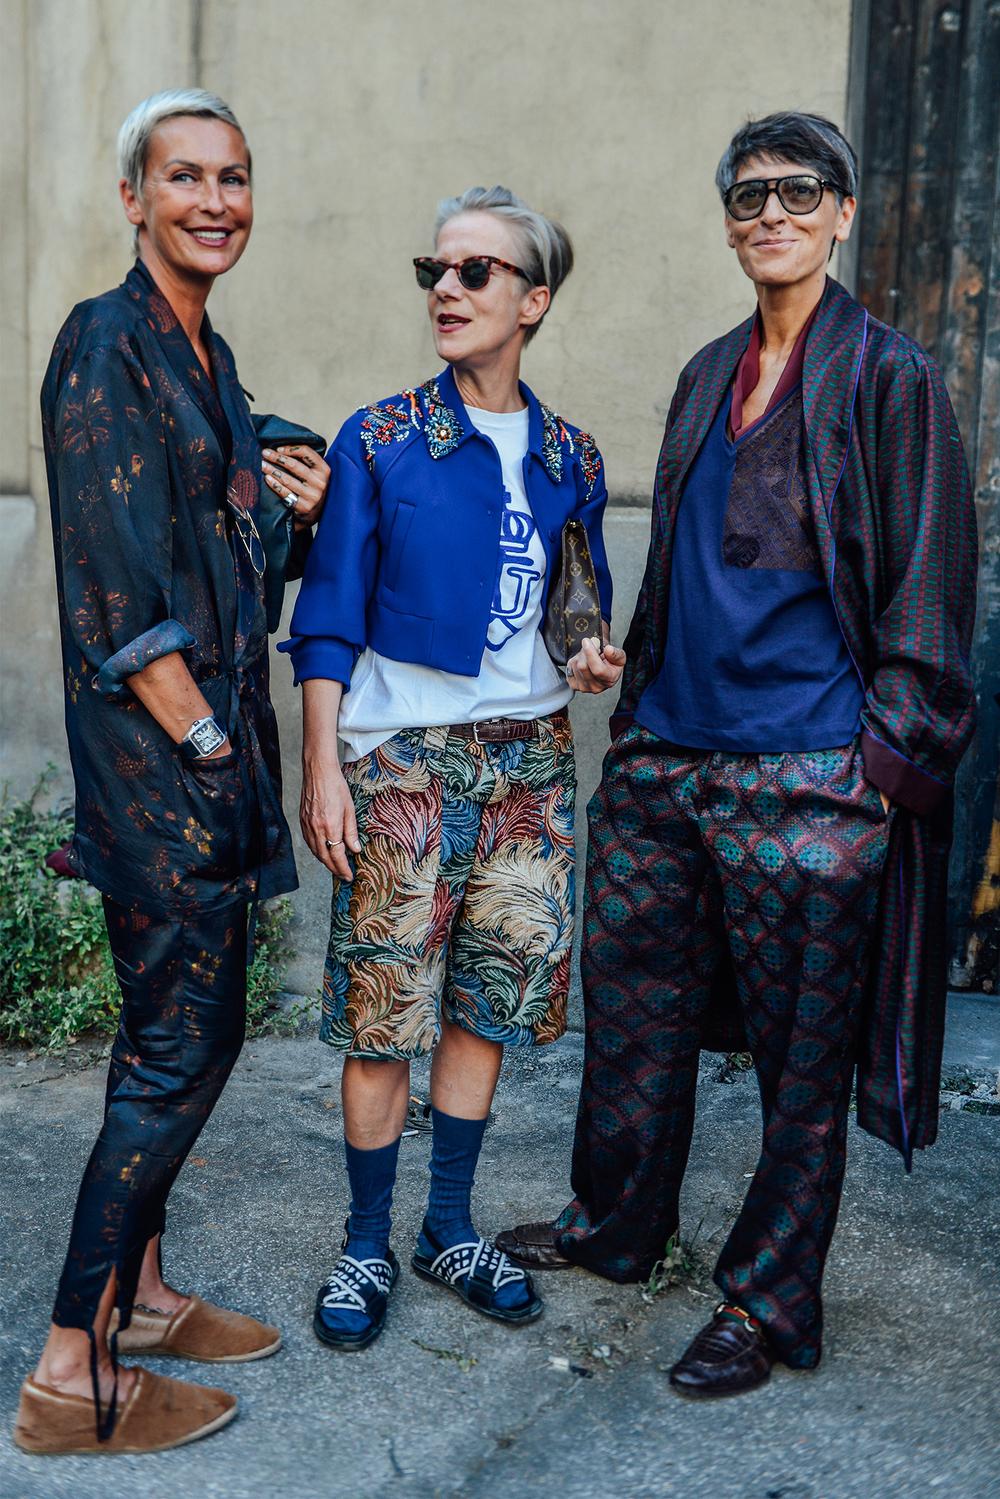 17-spring-2016-menswear-street-style-08.jpg